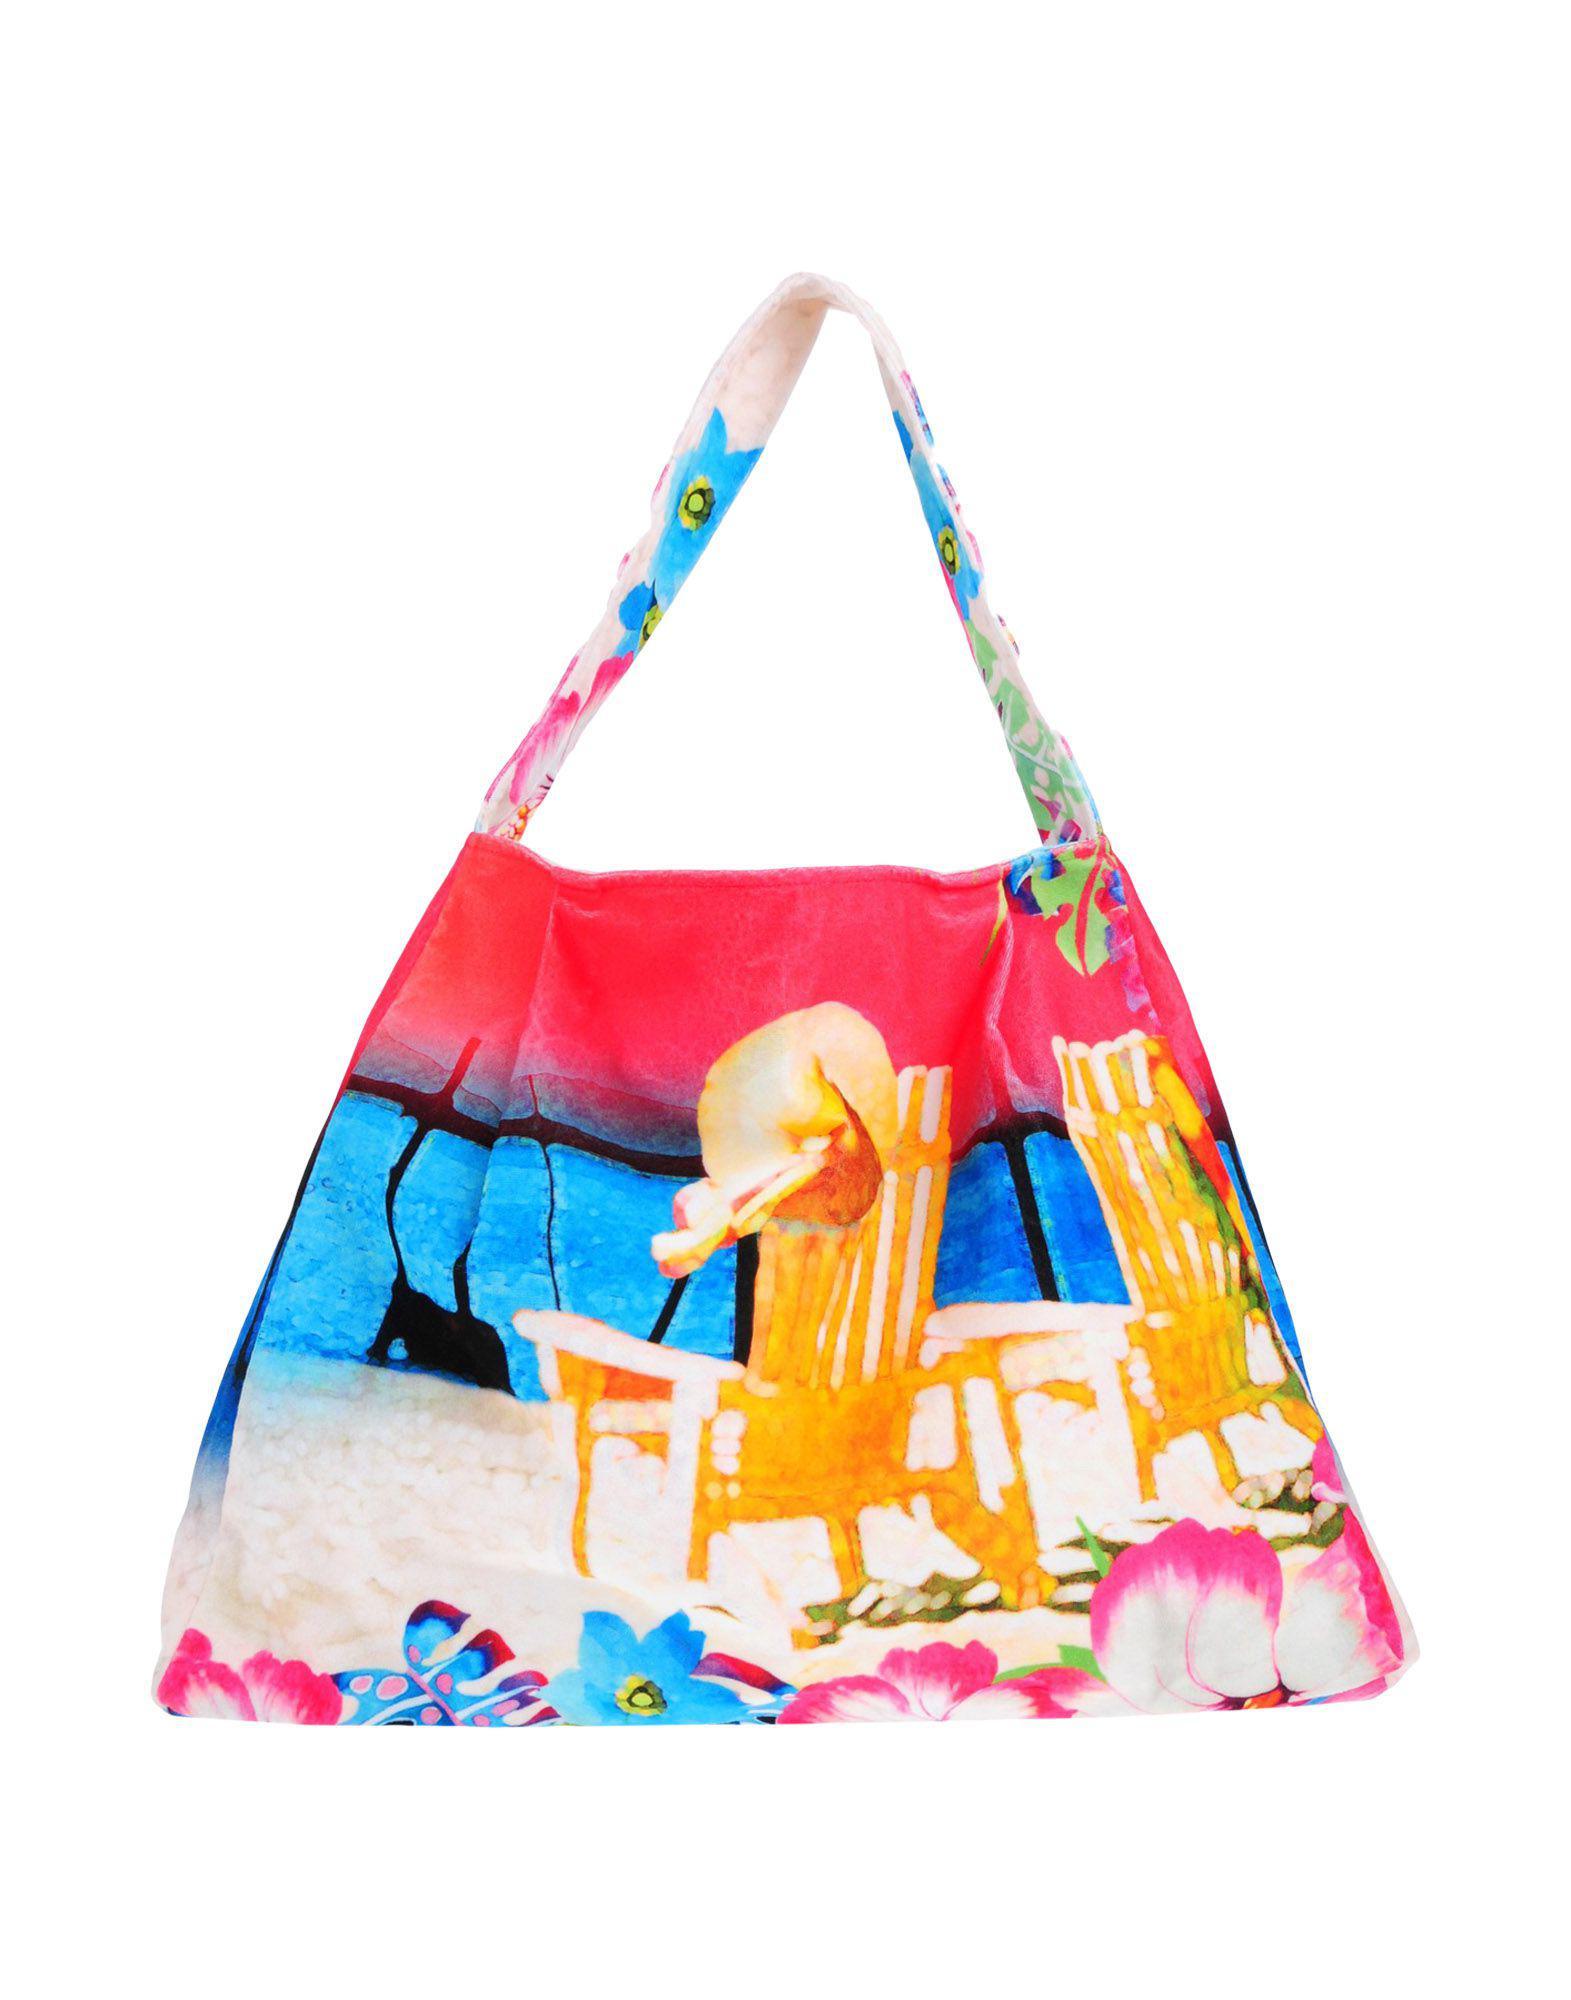 BAGS - Handbags Miss Naory 2iHpaiq8L